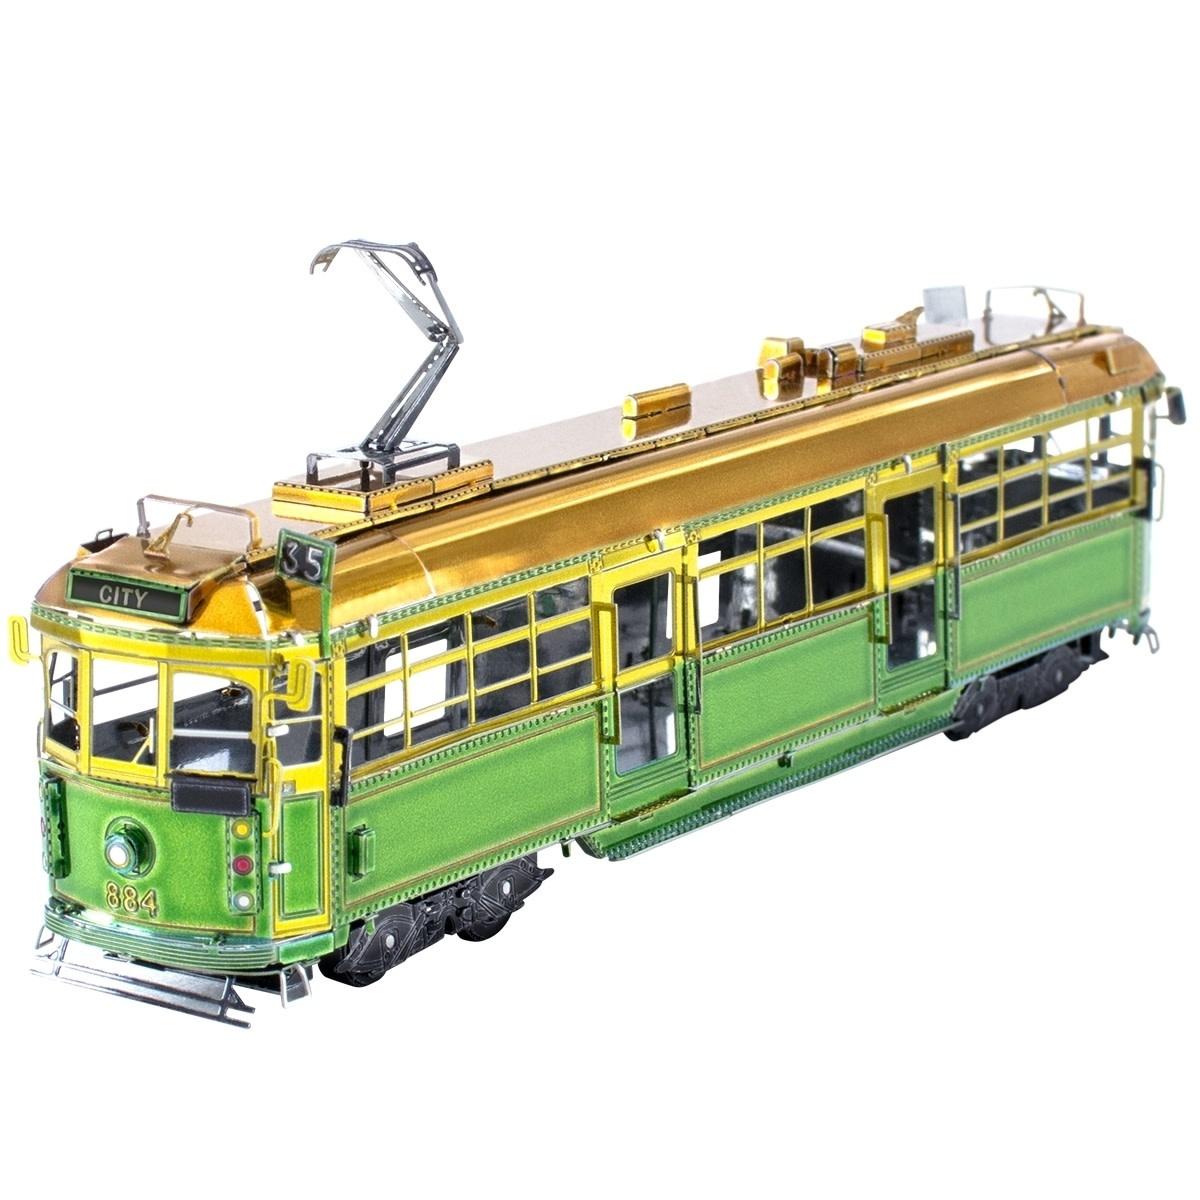 Fascinations Toys & Gifts Metal Model Kit Melborne W Class Tram